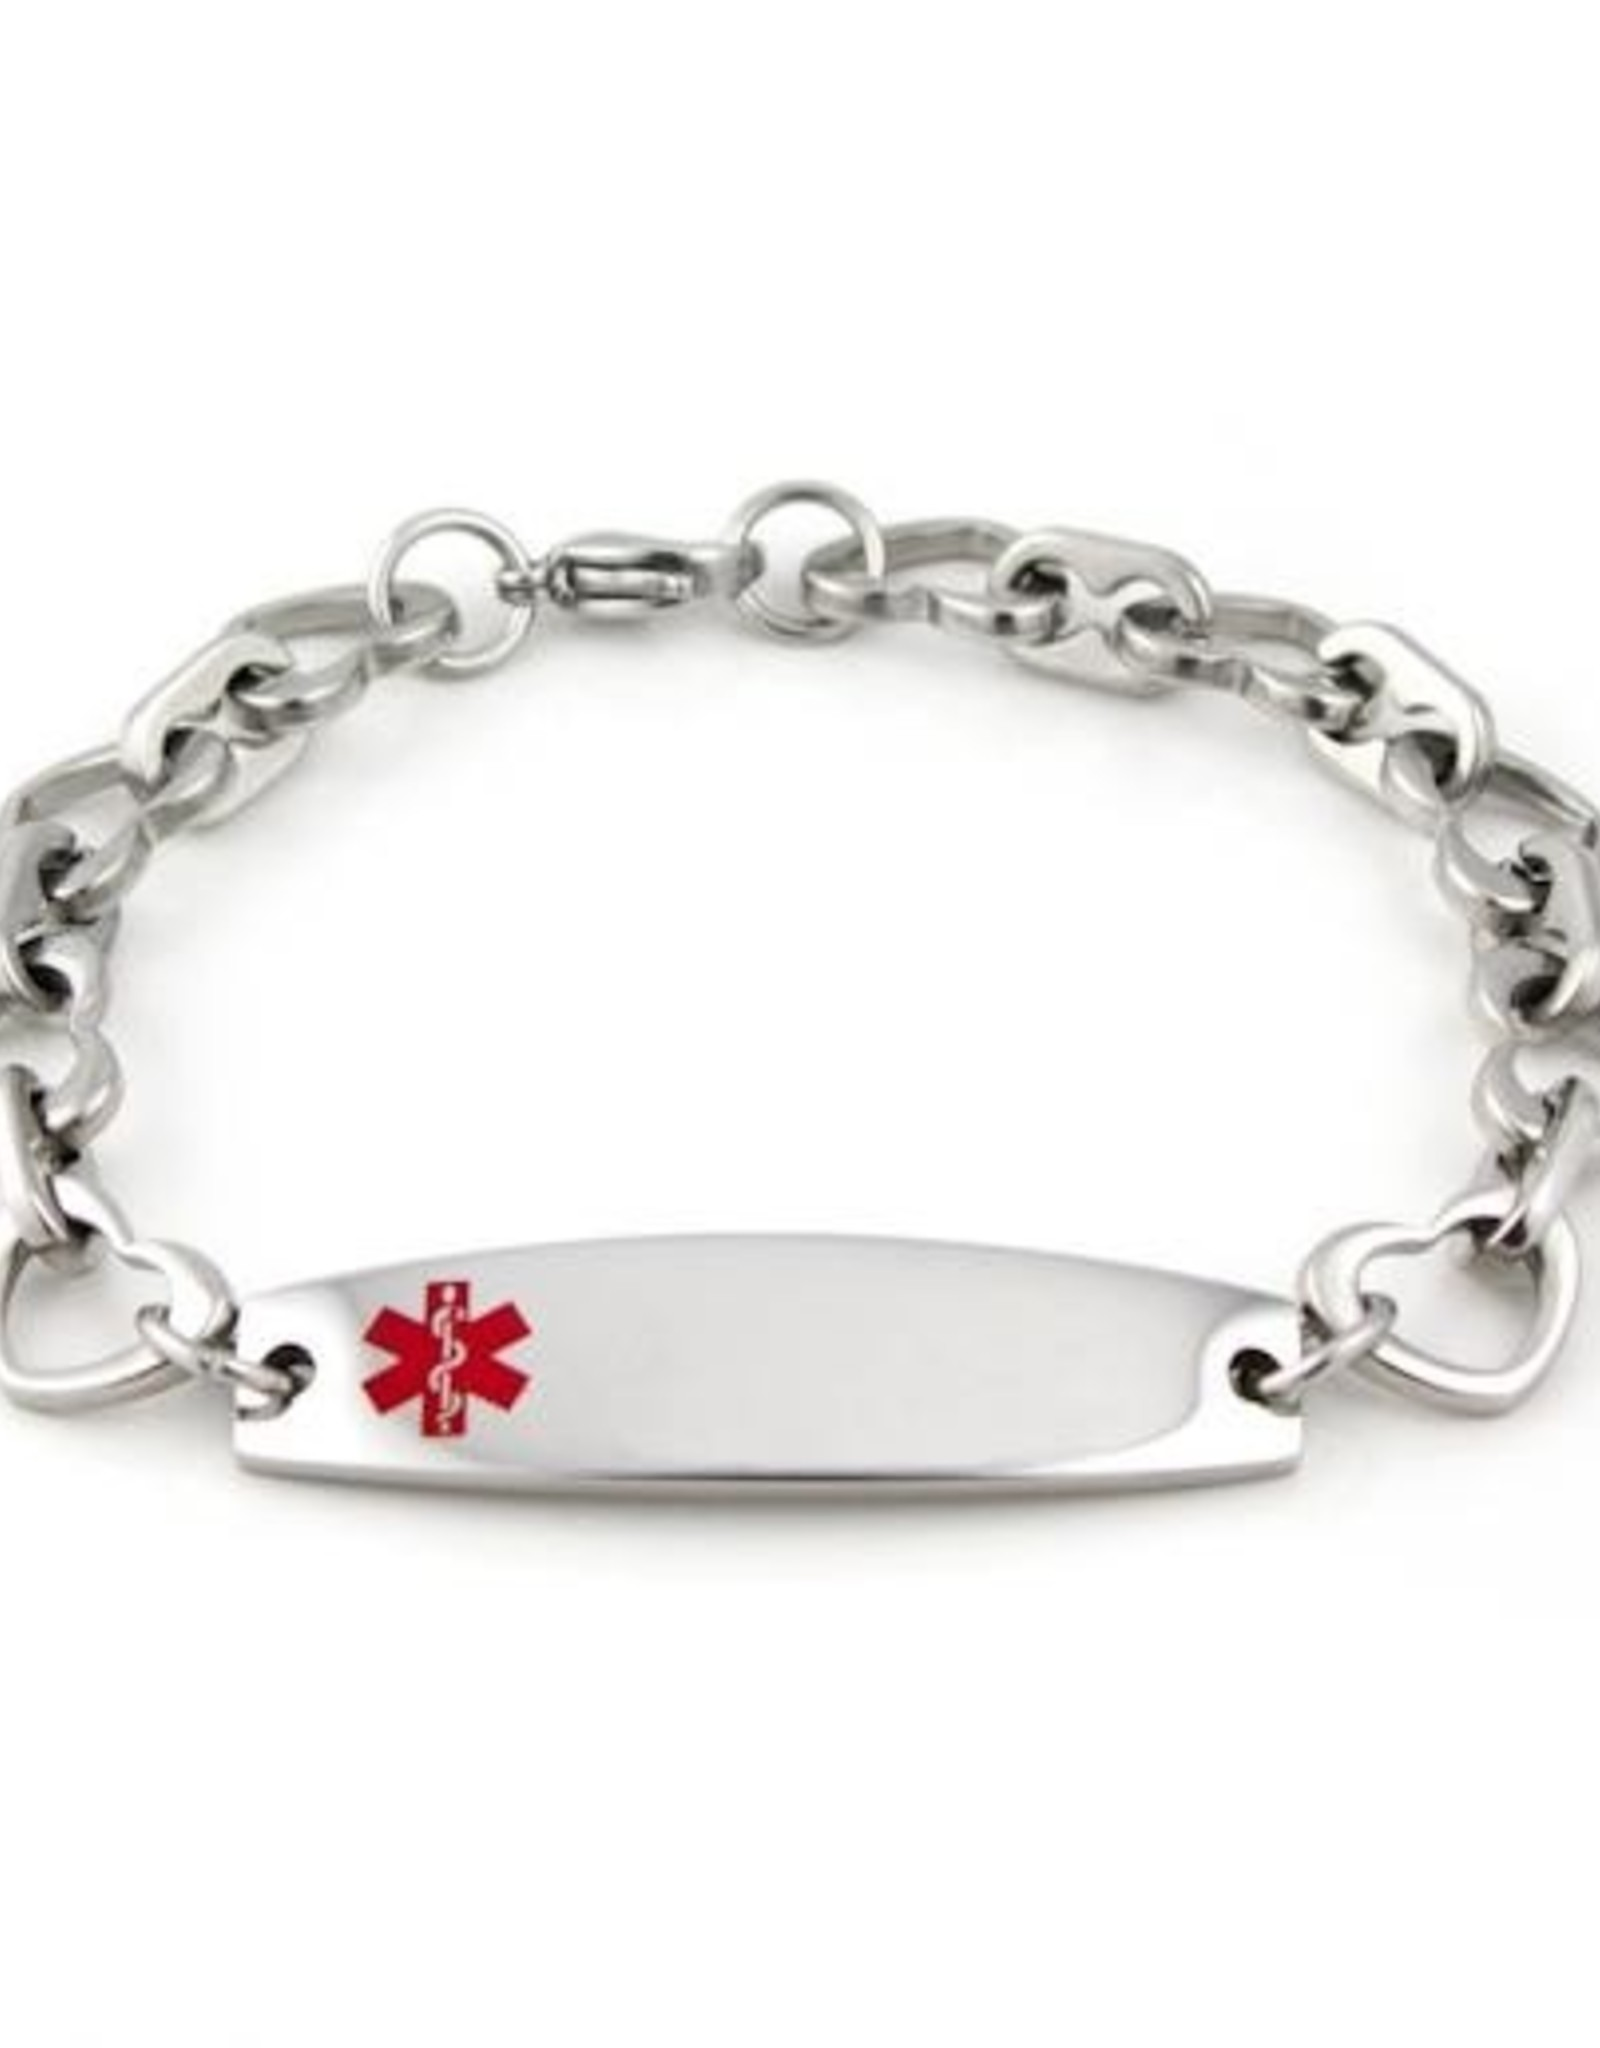 Bracelet Annemie